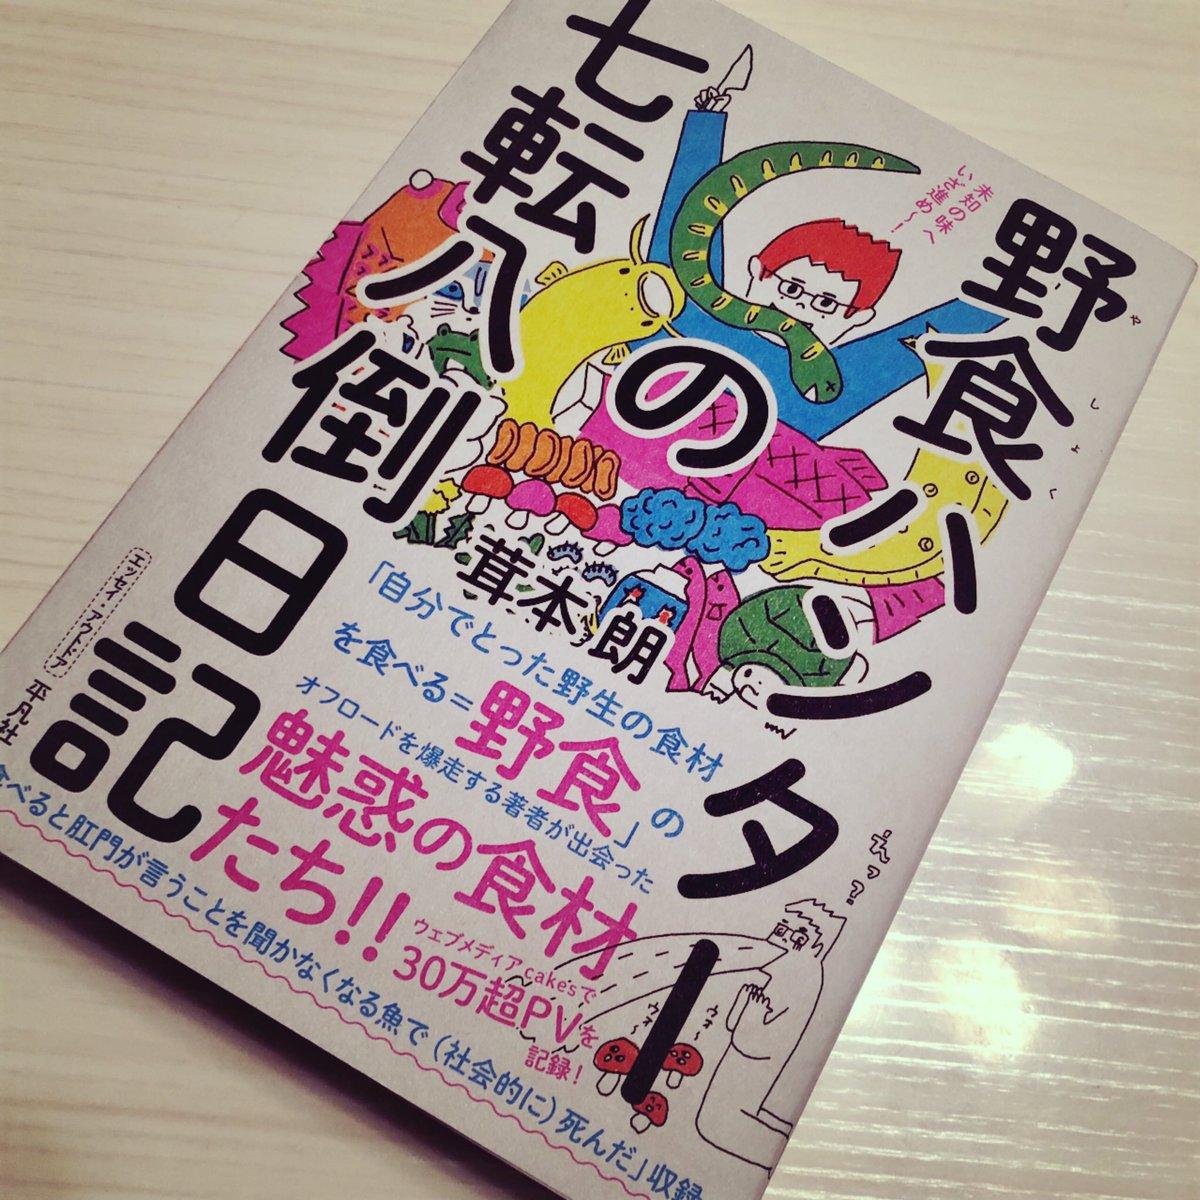 TOKYO FMのアプリ「WIZ RADIO」スペシャルコンテンツ 【倉持明日香のバトラジ!】 今回のゲストは、、 野食家の茸本朗さん 未知の世界へ… 皆さま一緒に新たな扉をひらきましょう… スゴ得会員様の配信は始まってます… https://t.co/8OQ7Hmvis4